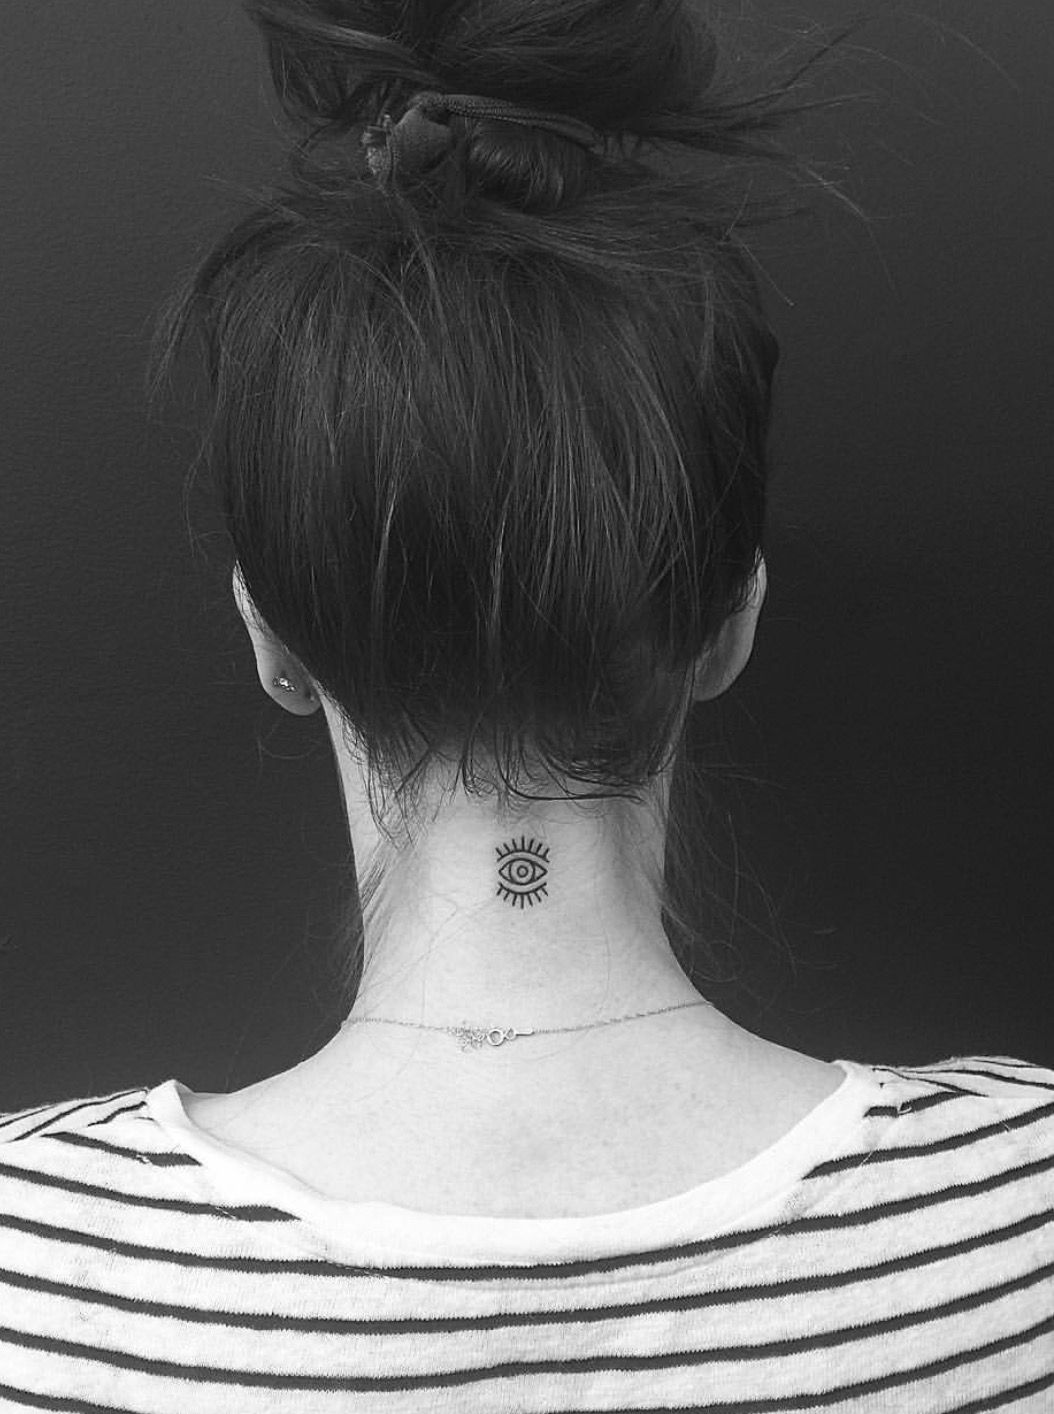 Evil Eye Neck Tattoo Neck tattoos women, Small girl